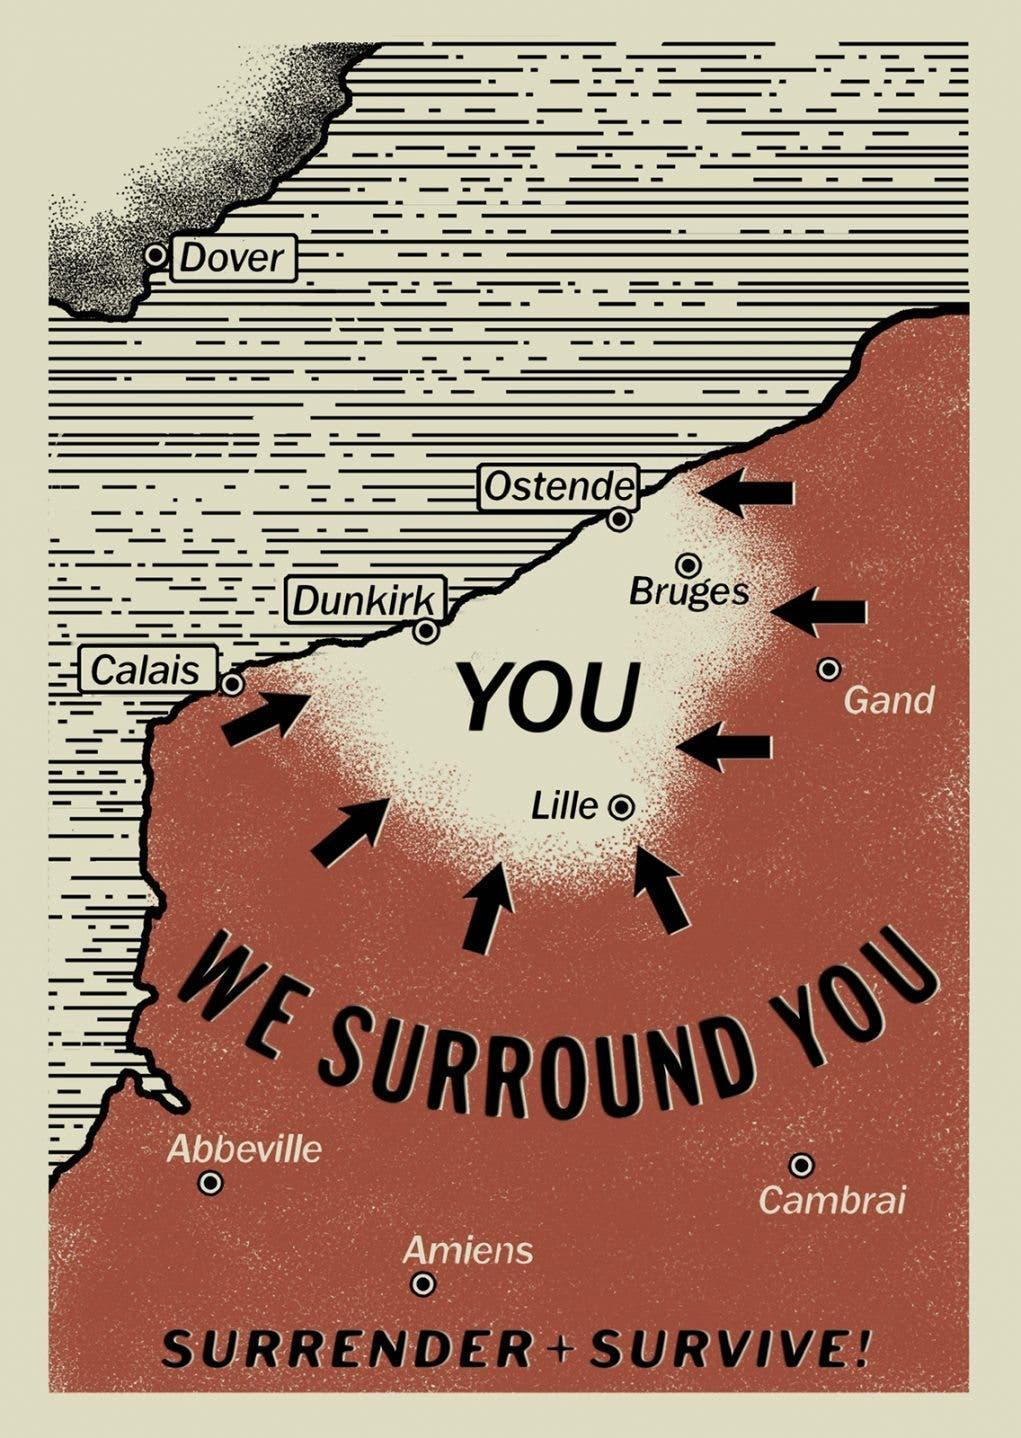 Tráiler de 'Dunkirk': Así es la guerra según Christopher Nolan